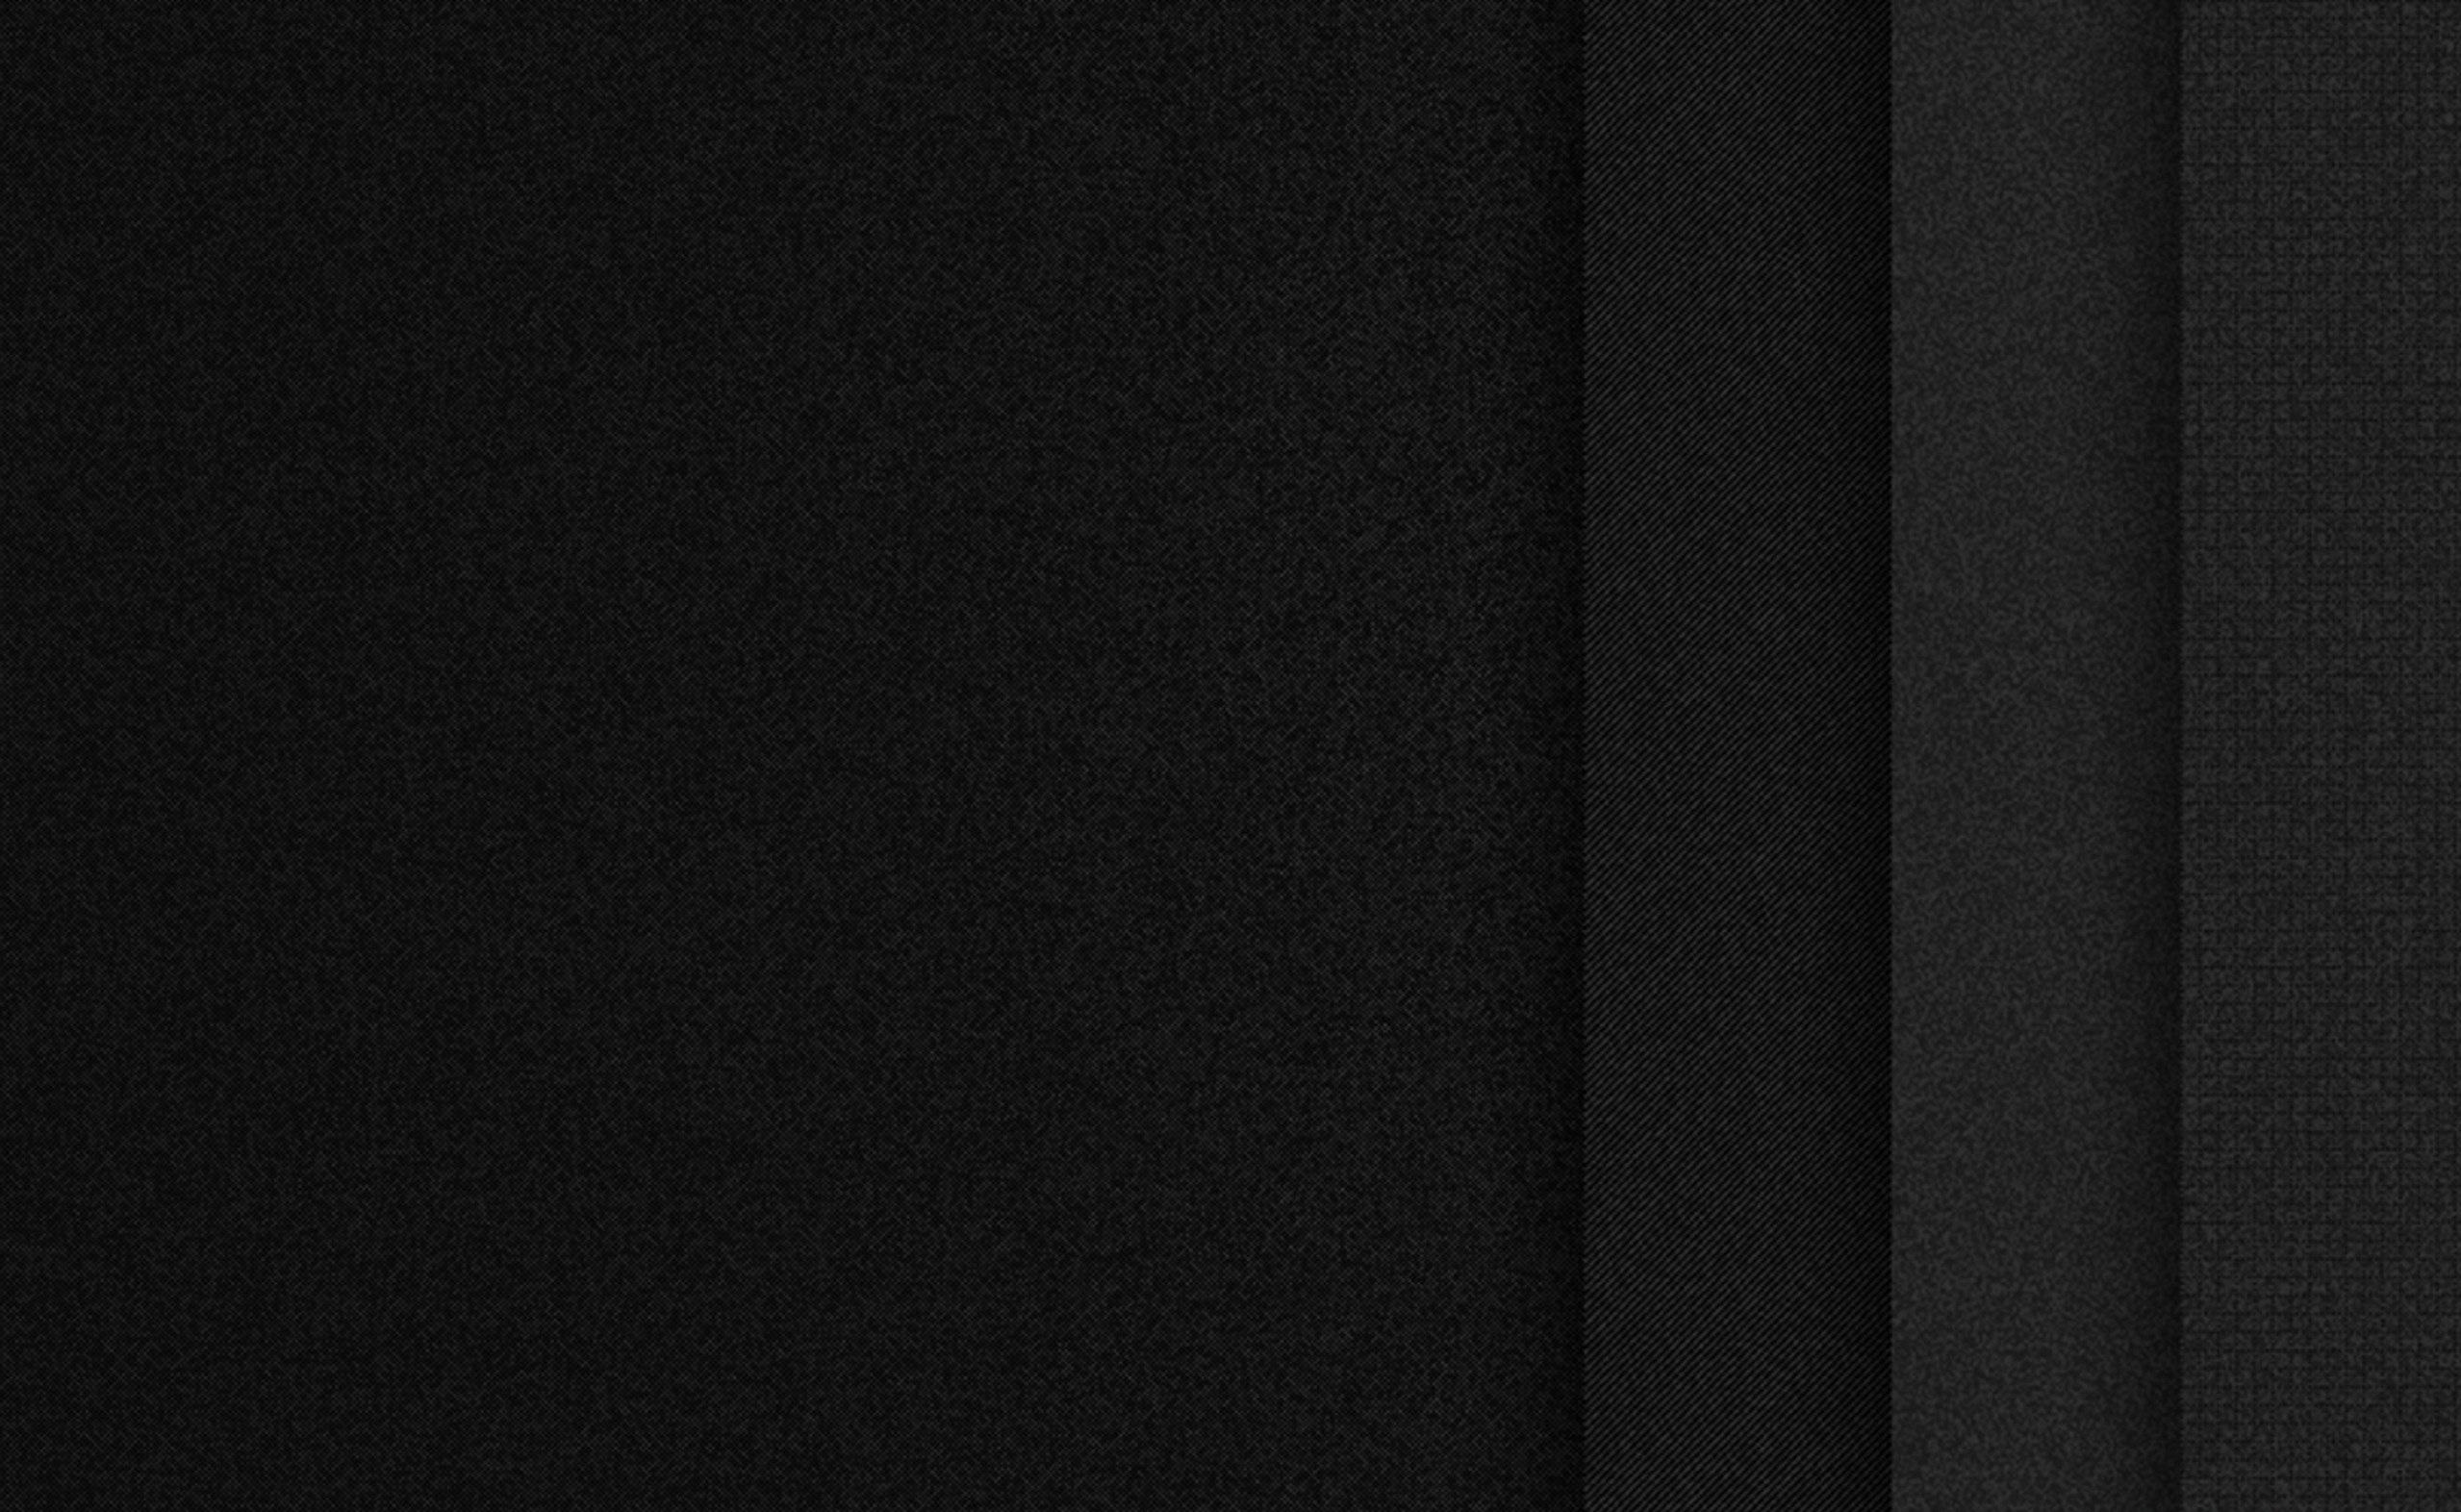 Black Wood Hd Background